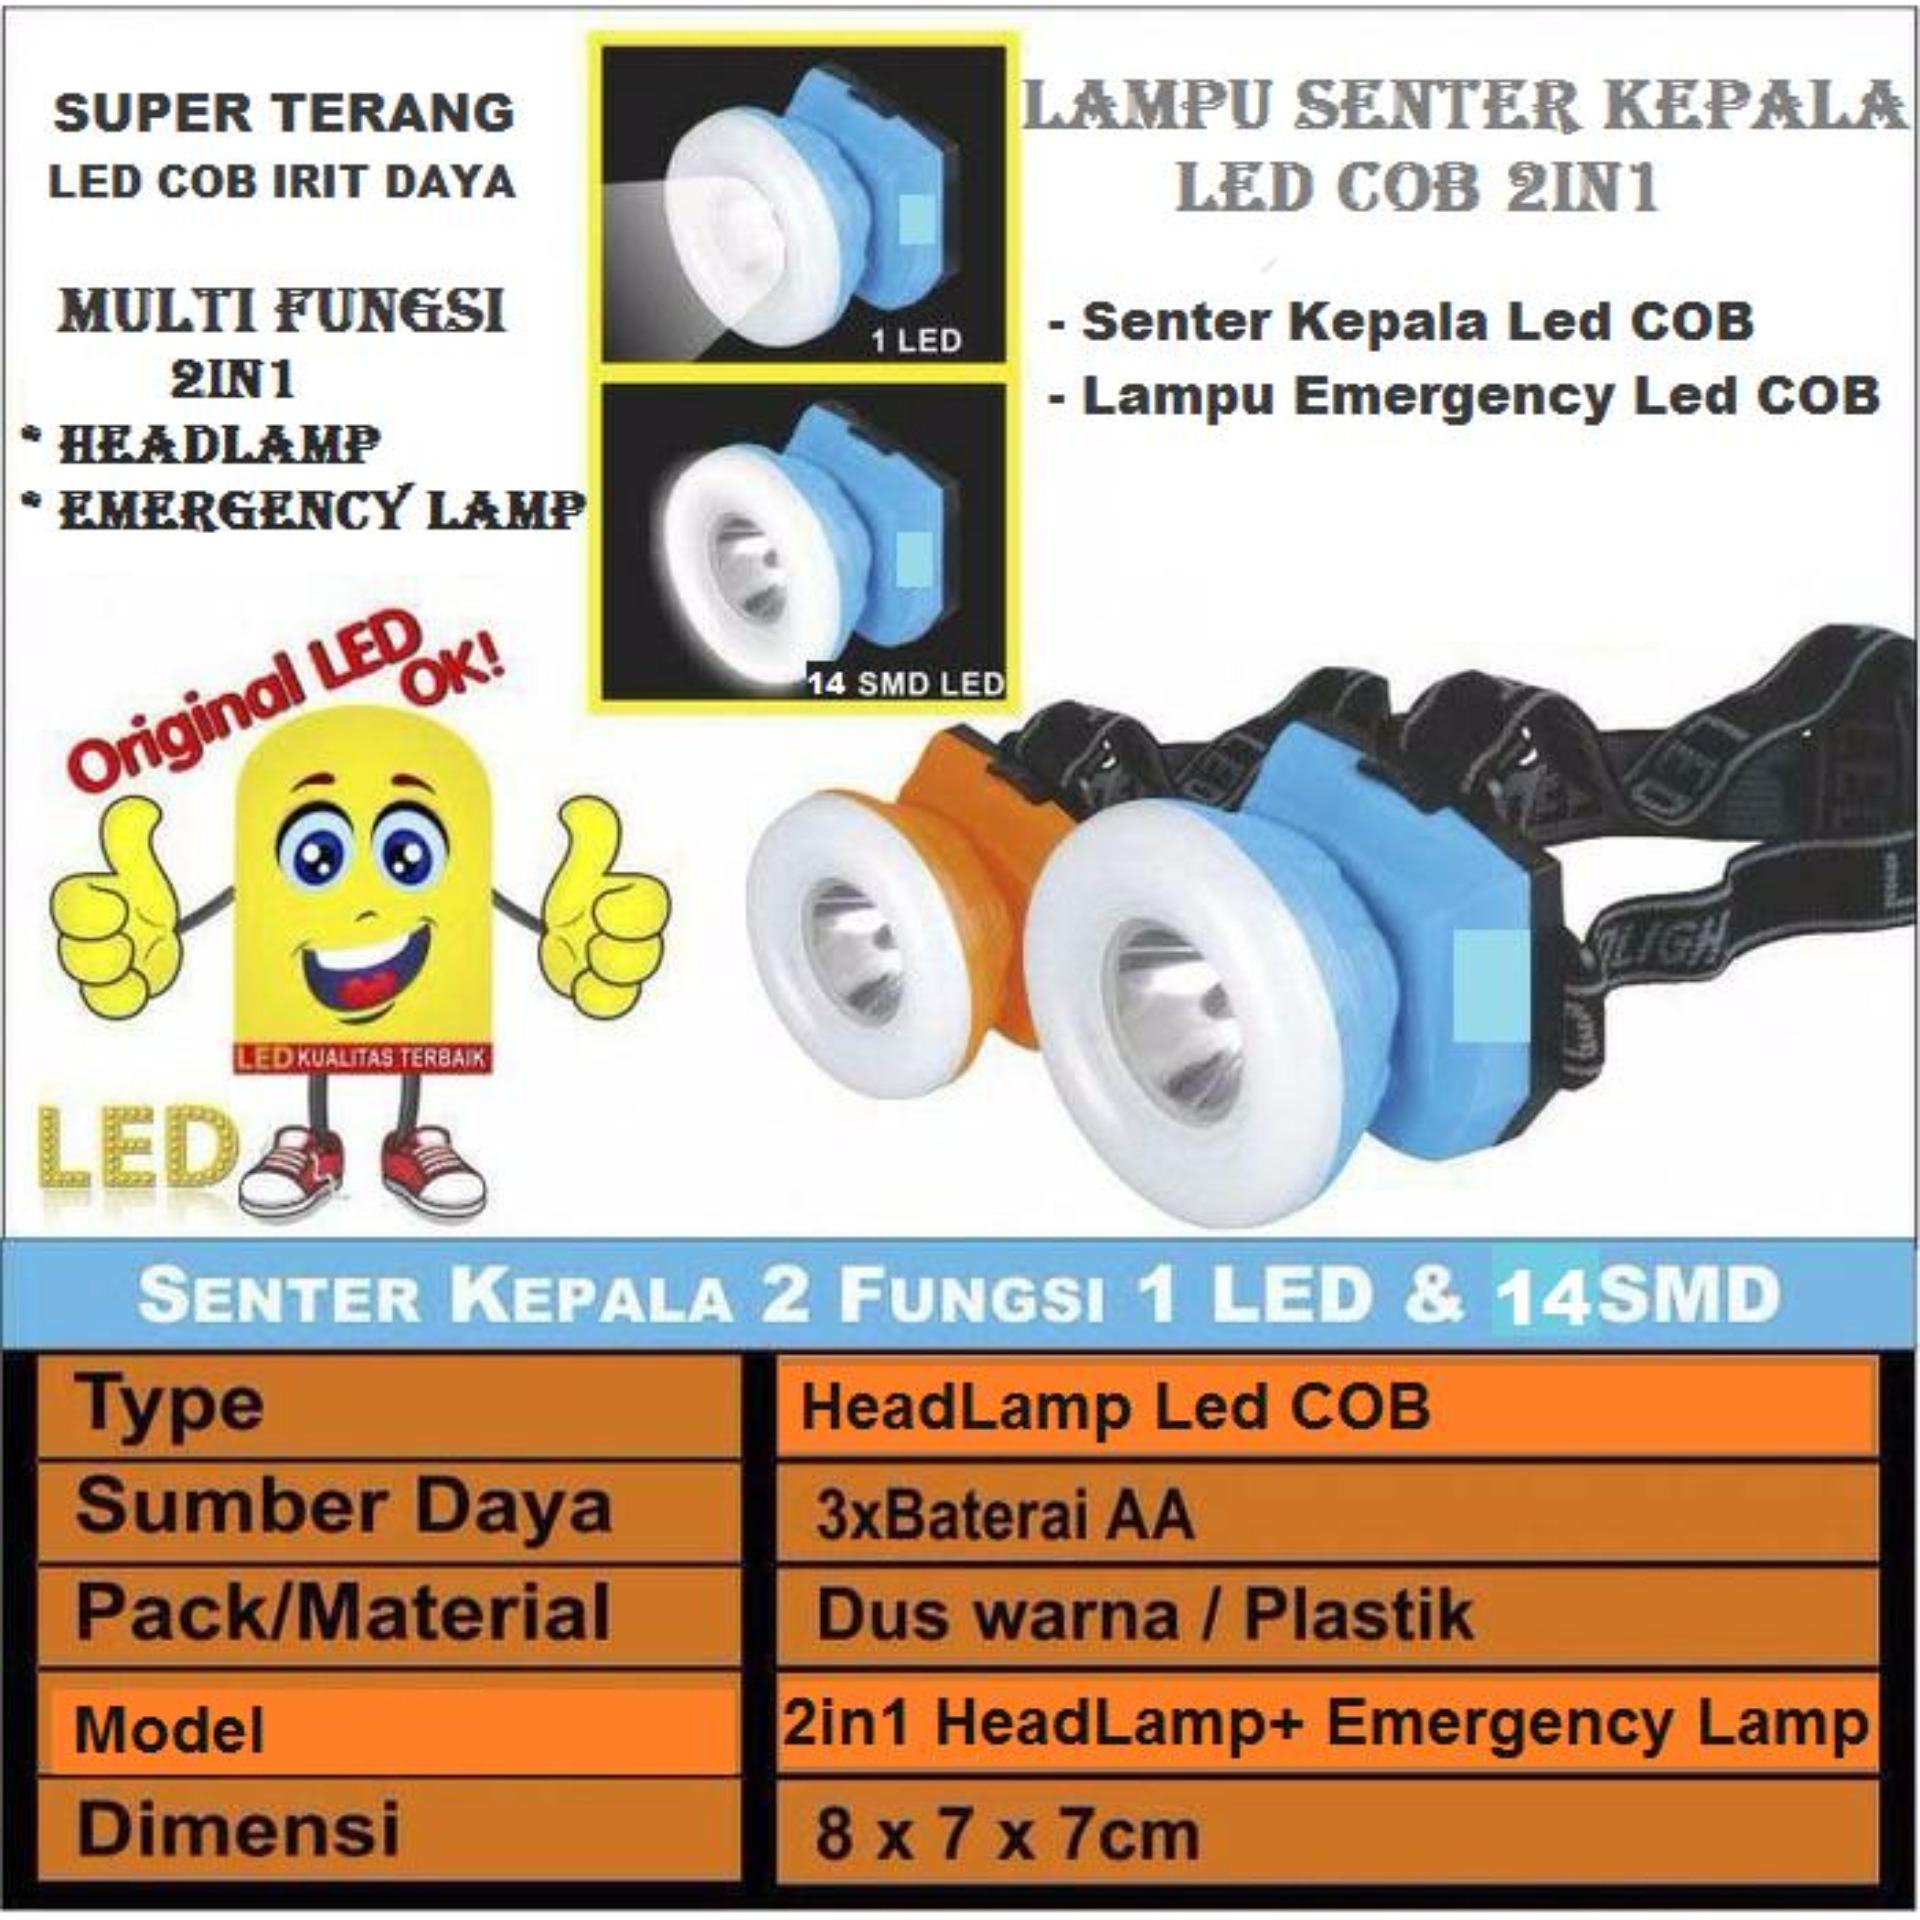 Pencari Harga Lampu Senter Kepala LED COB 2in1 - Head Lamp Led 2in1 dan emergency lamp led cob - senter kepala 2fungsi terbaik murah - Hanya Rp57.760